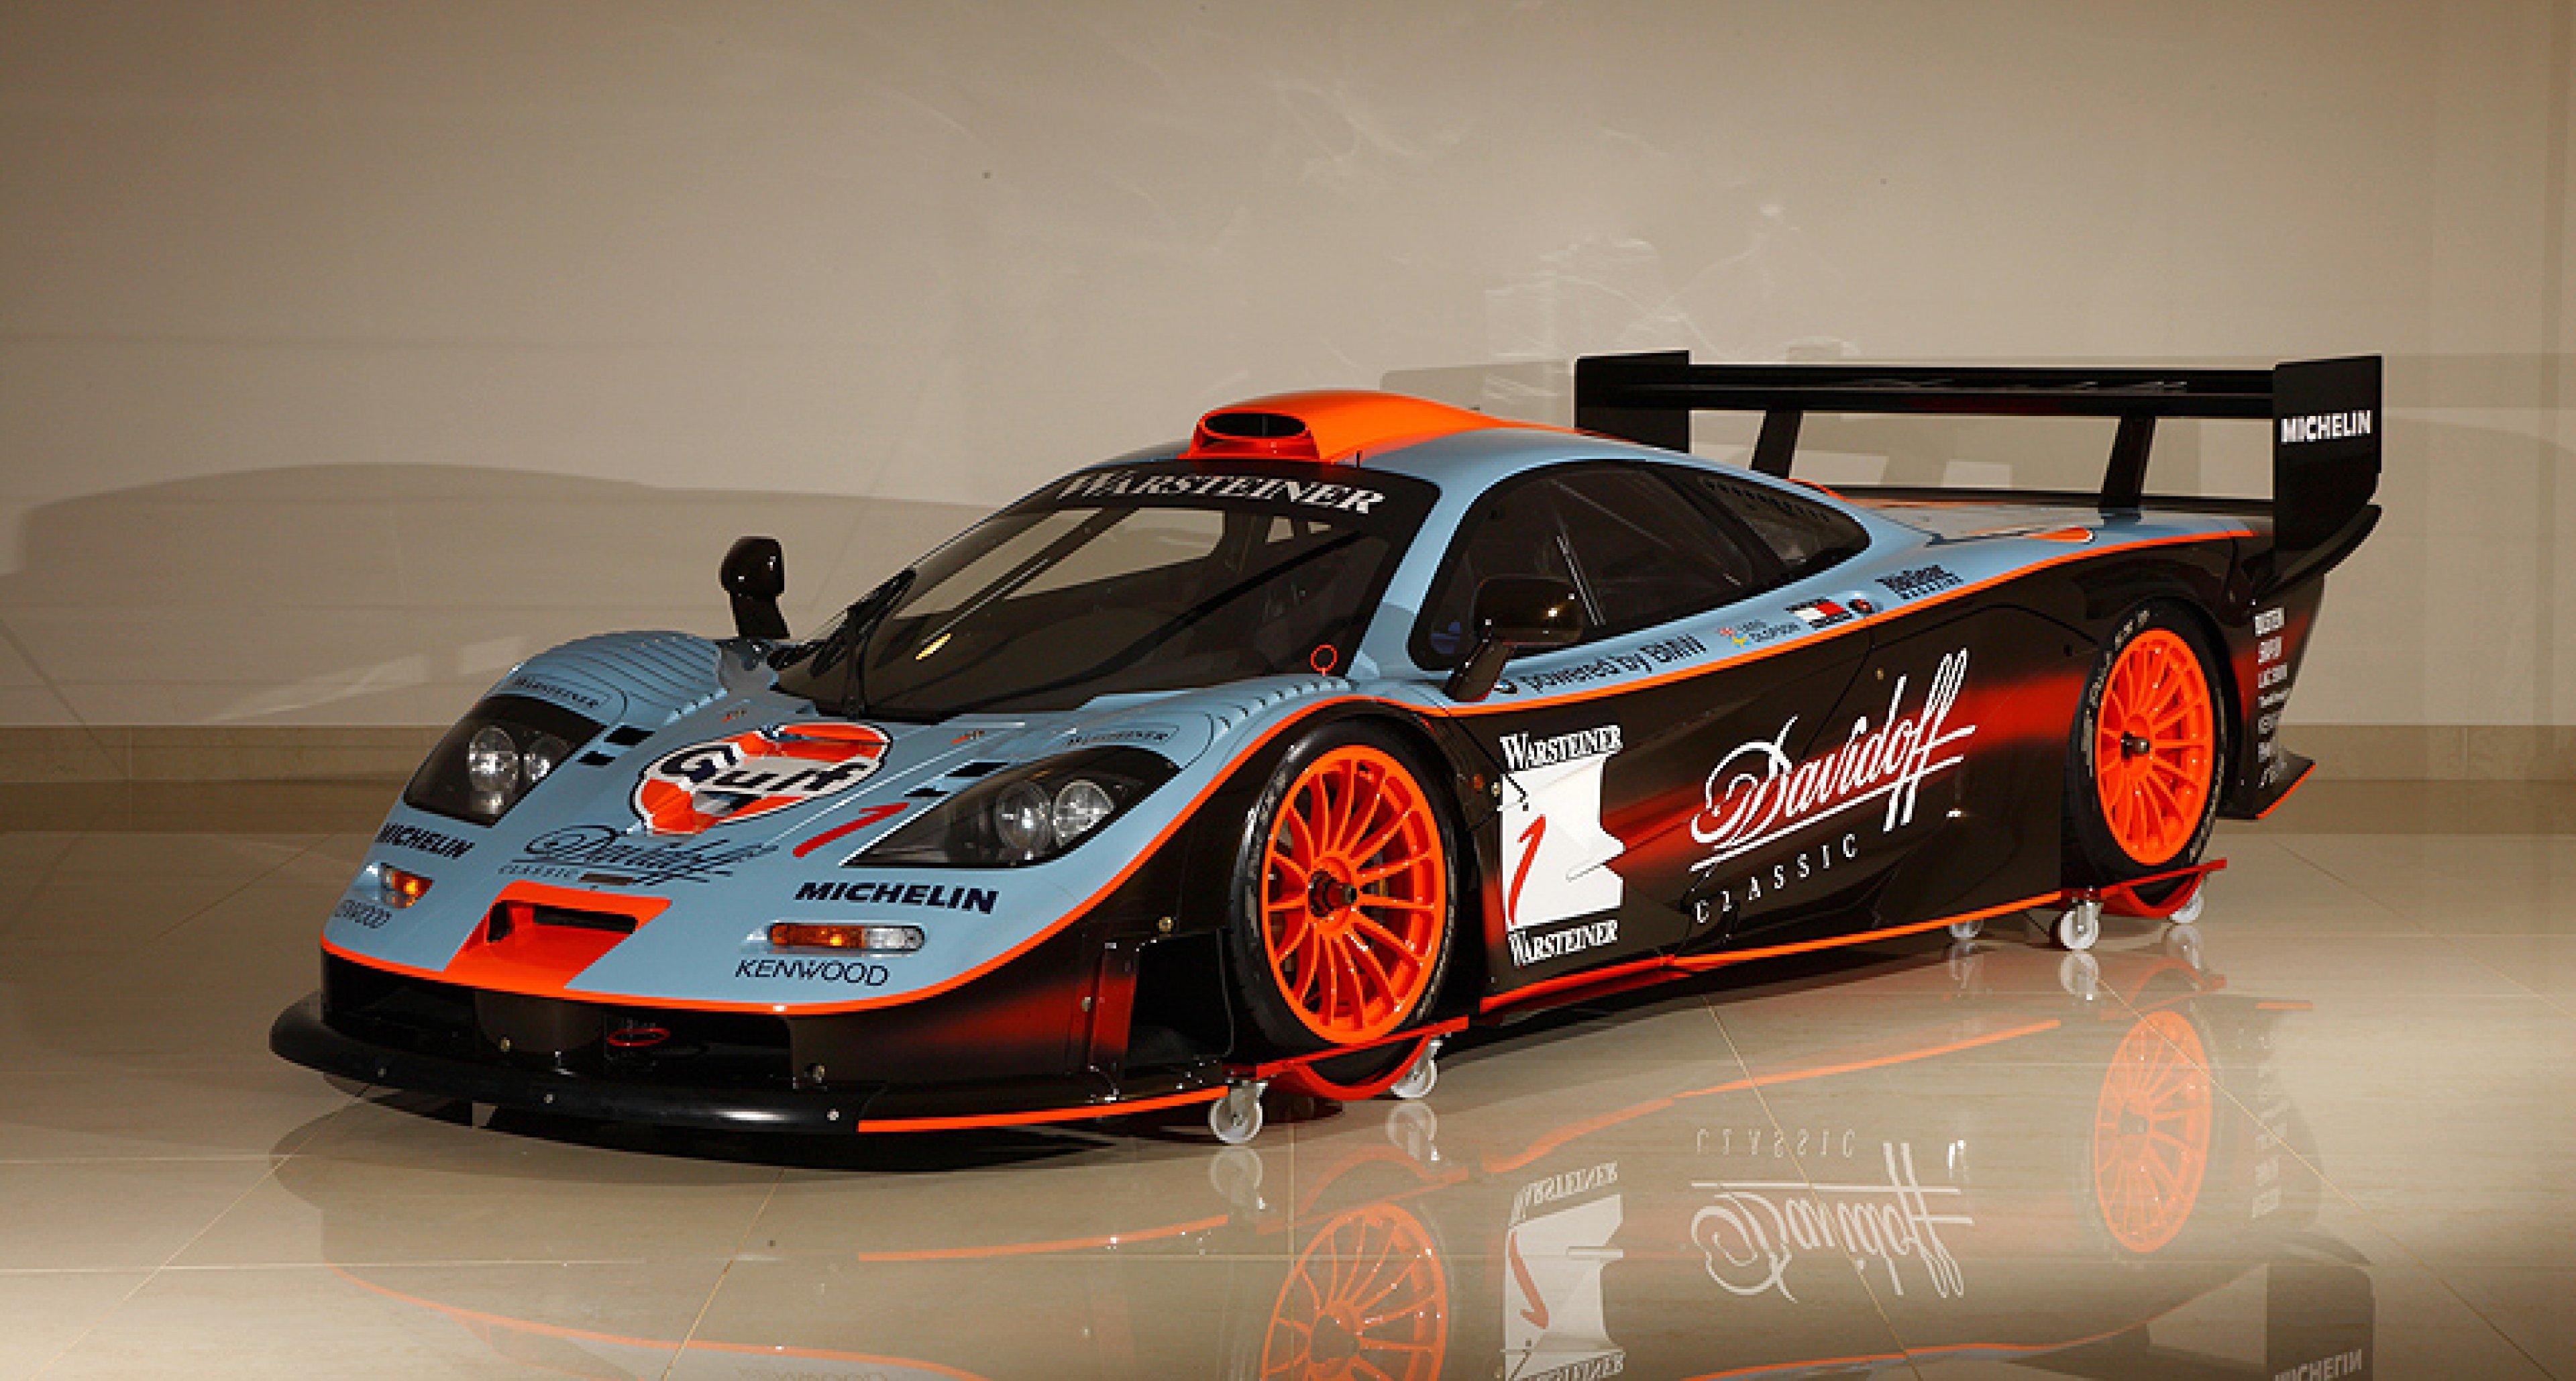 1997 McLaren F1 GTR Longtail To Star At Bonhams 2012